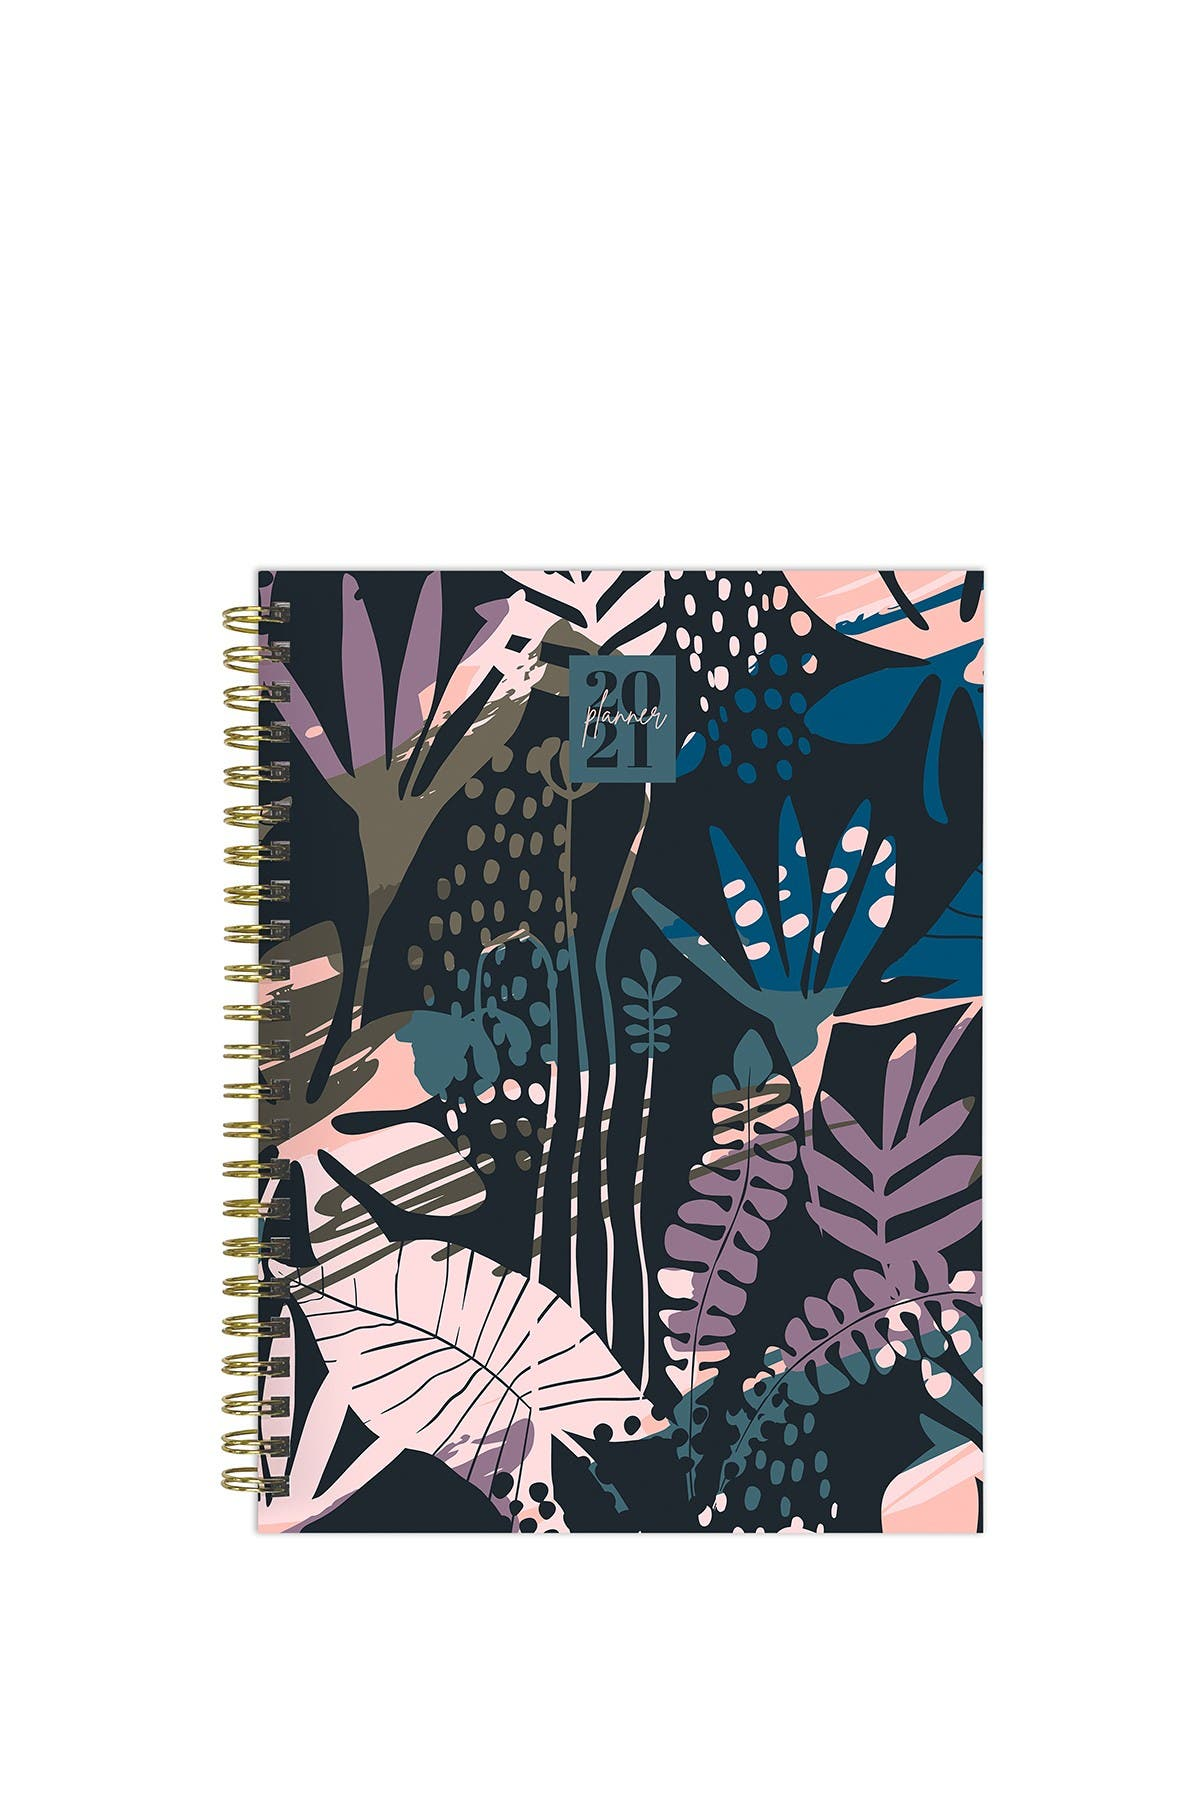 Image of TF Publishing 2021 Painted Foliage Medium Weekly Monthly Planner